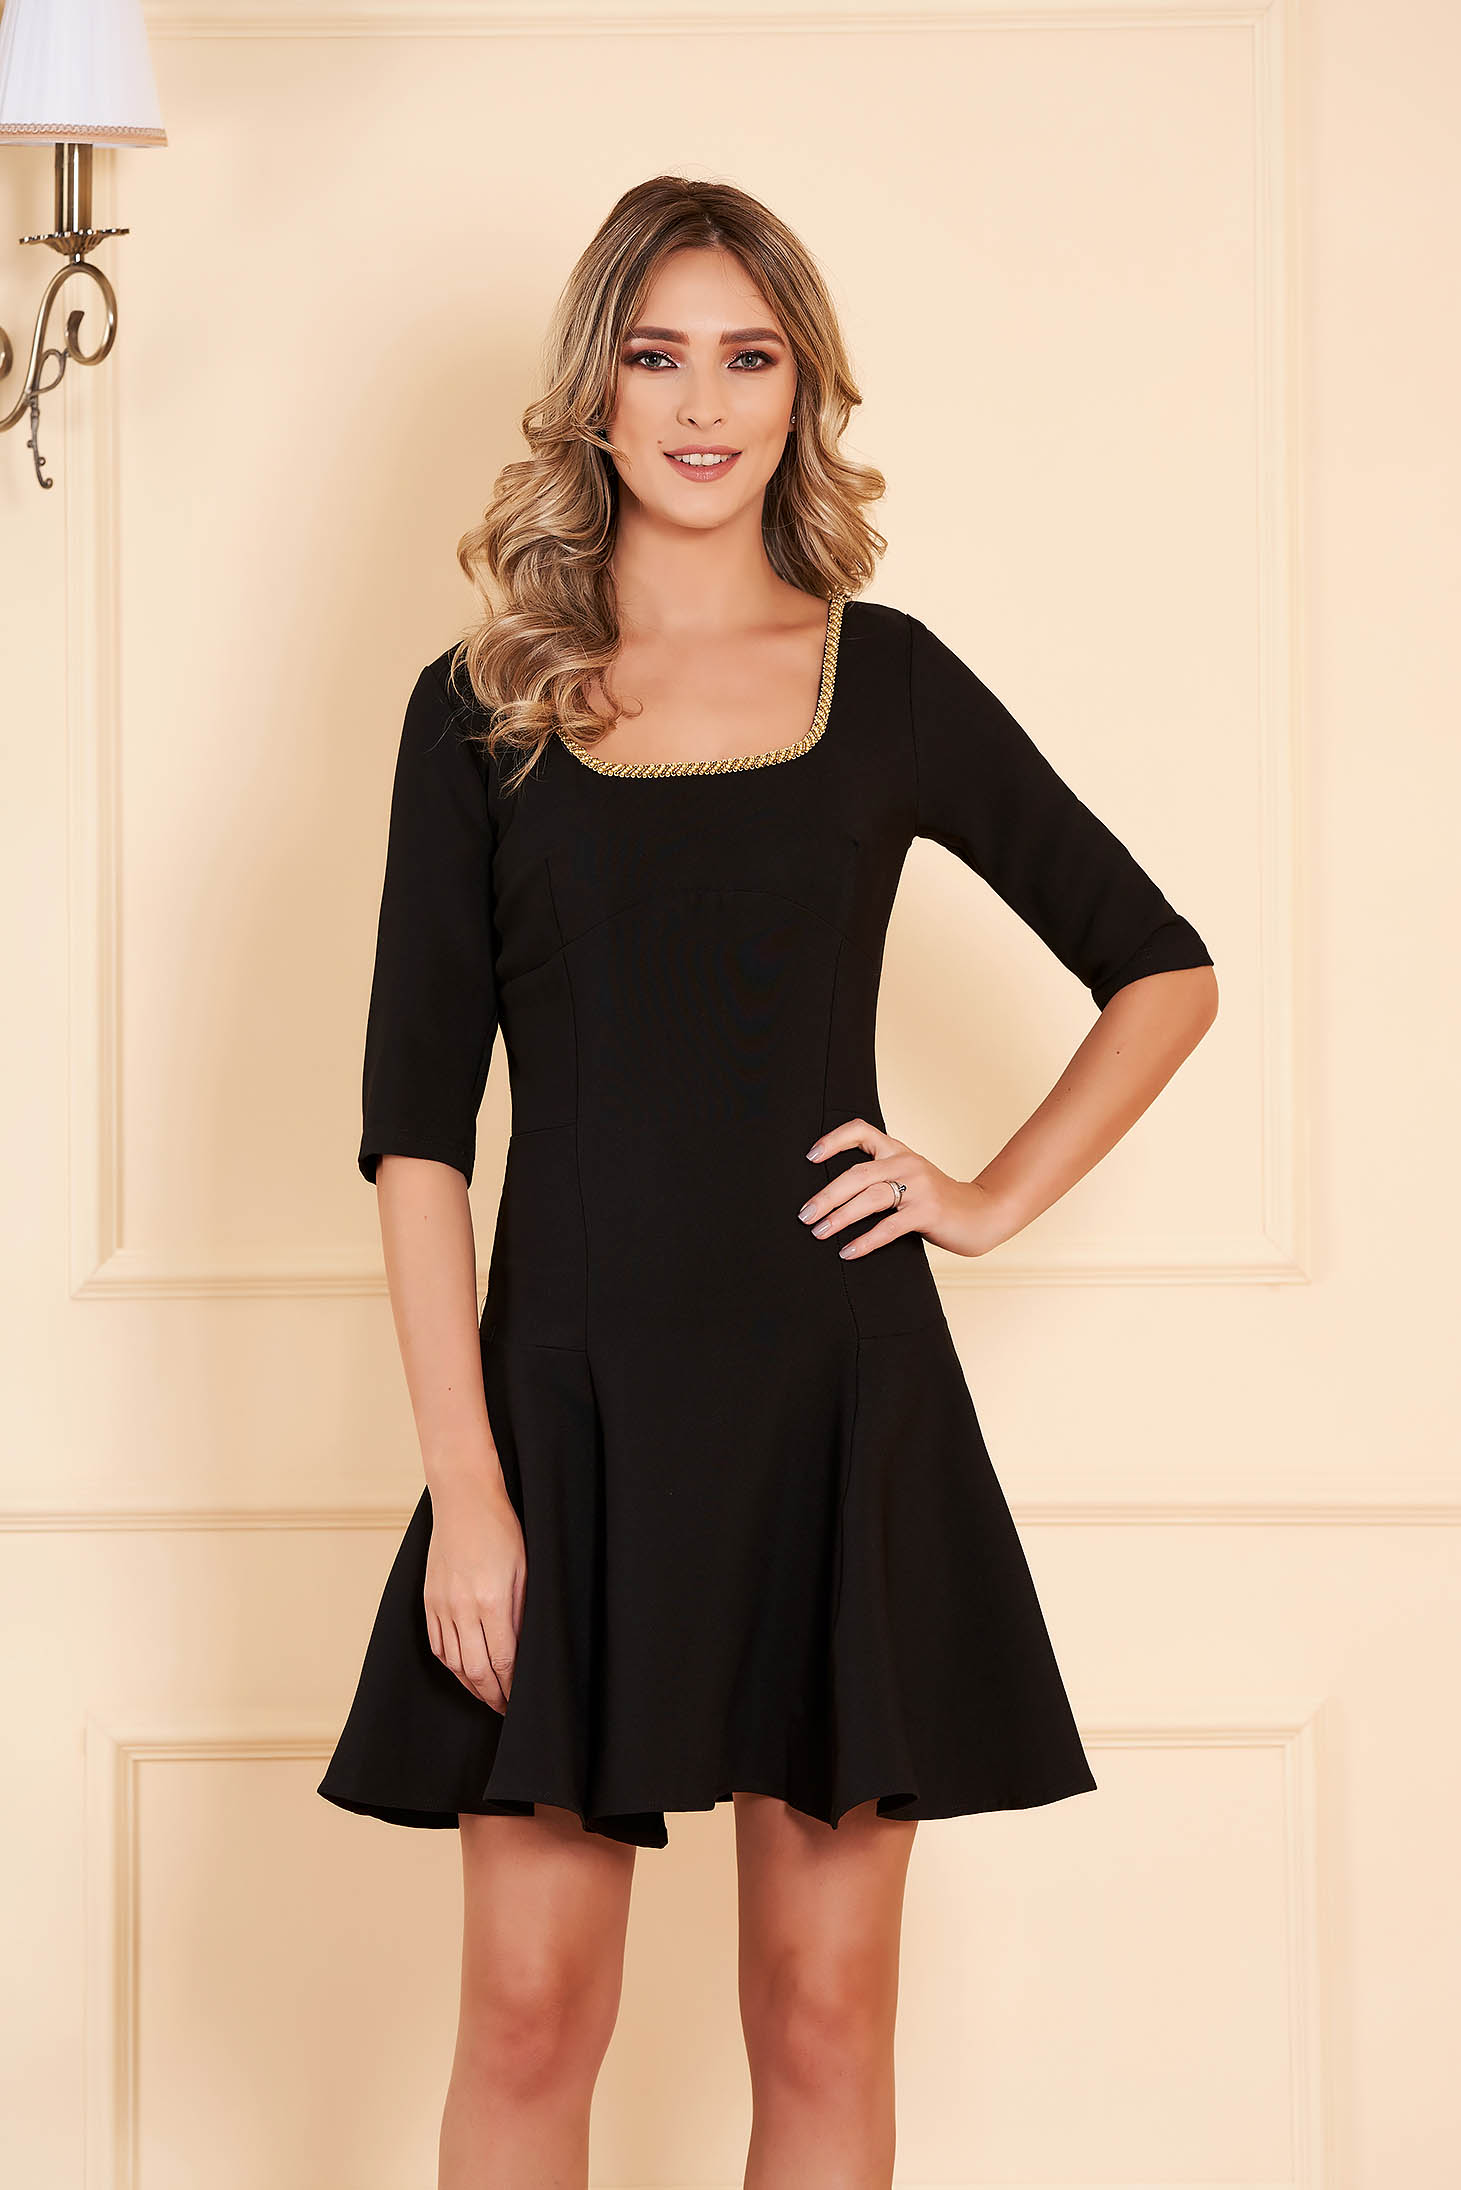 Dress black occasional flaring cut short cut slightly elastic fabric with 3/4 sleeves